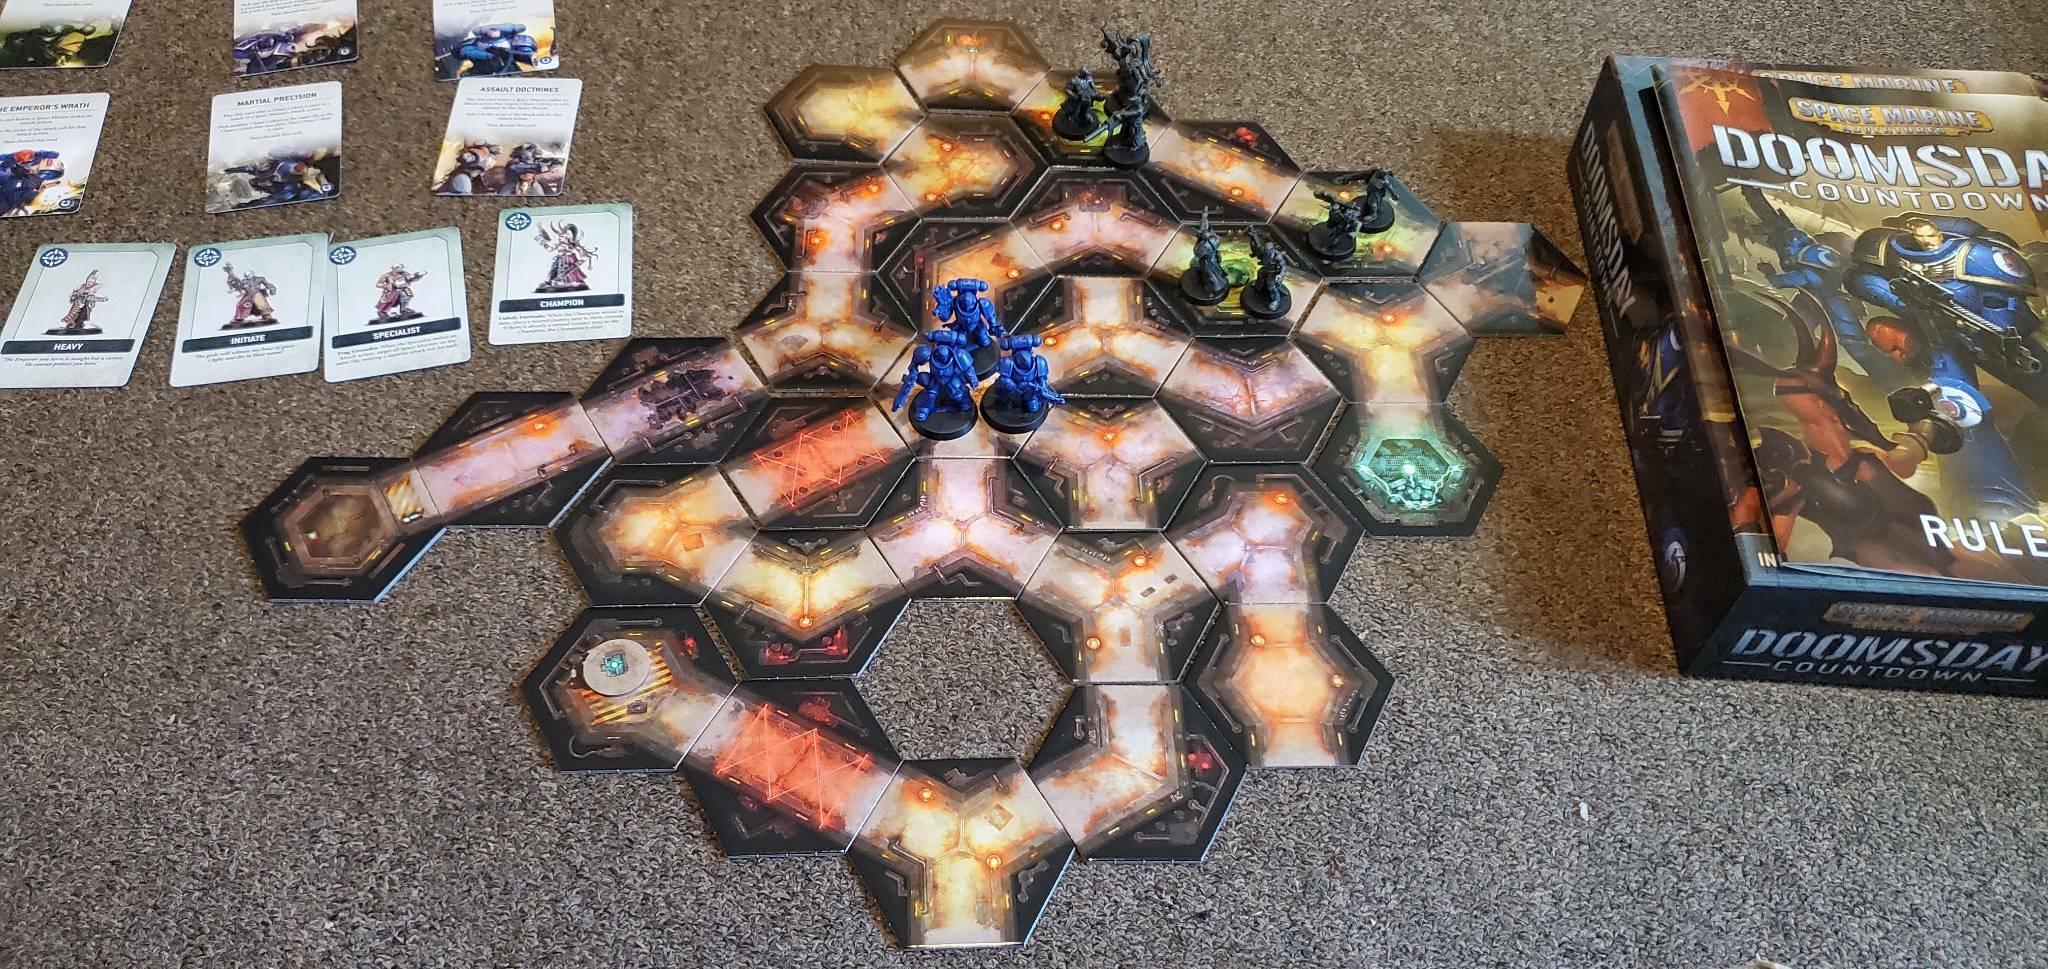 Warhammer 40.000 boardgames